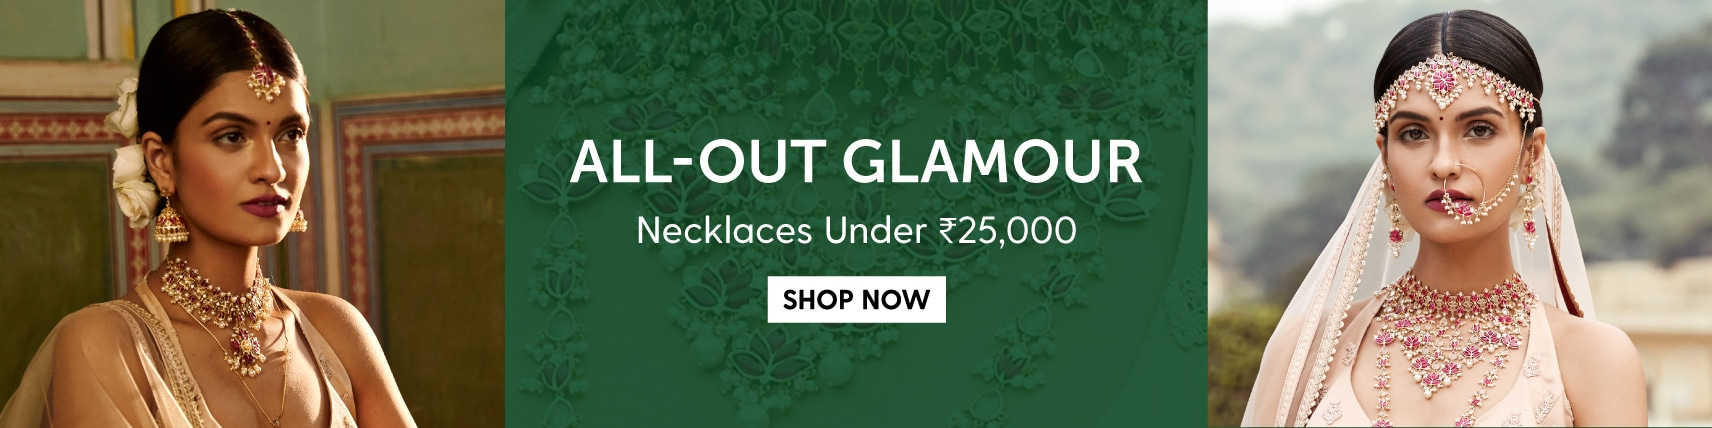 necklace-under-25000/?utm_source=LandingPage&utm_medium=Banner&utm_campaign=Necklaces-Under-25K